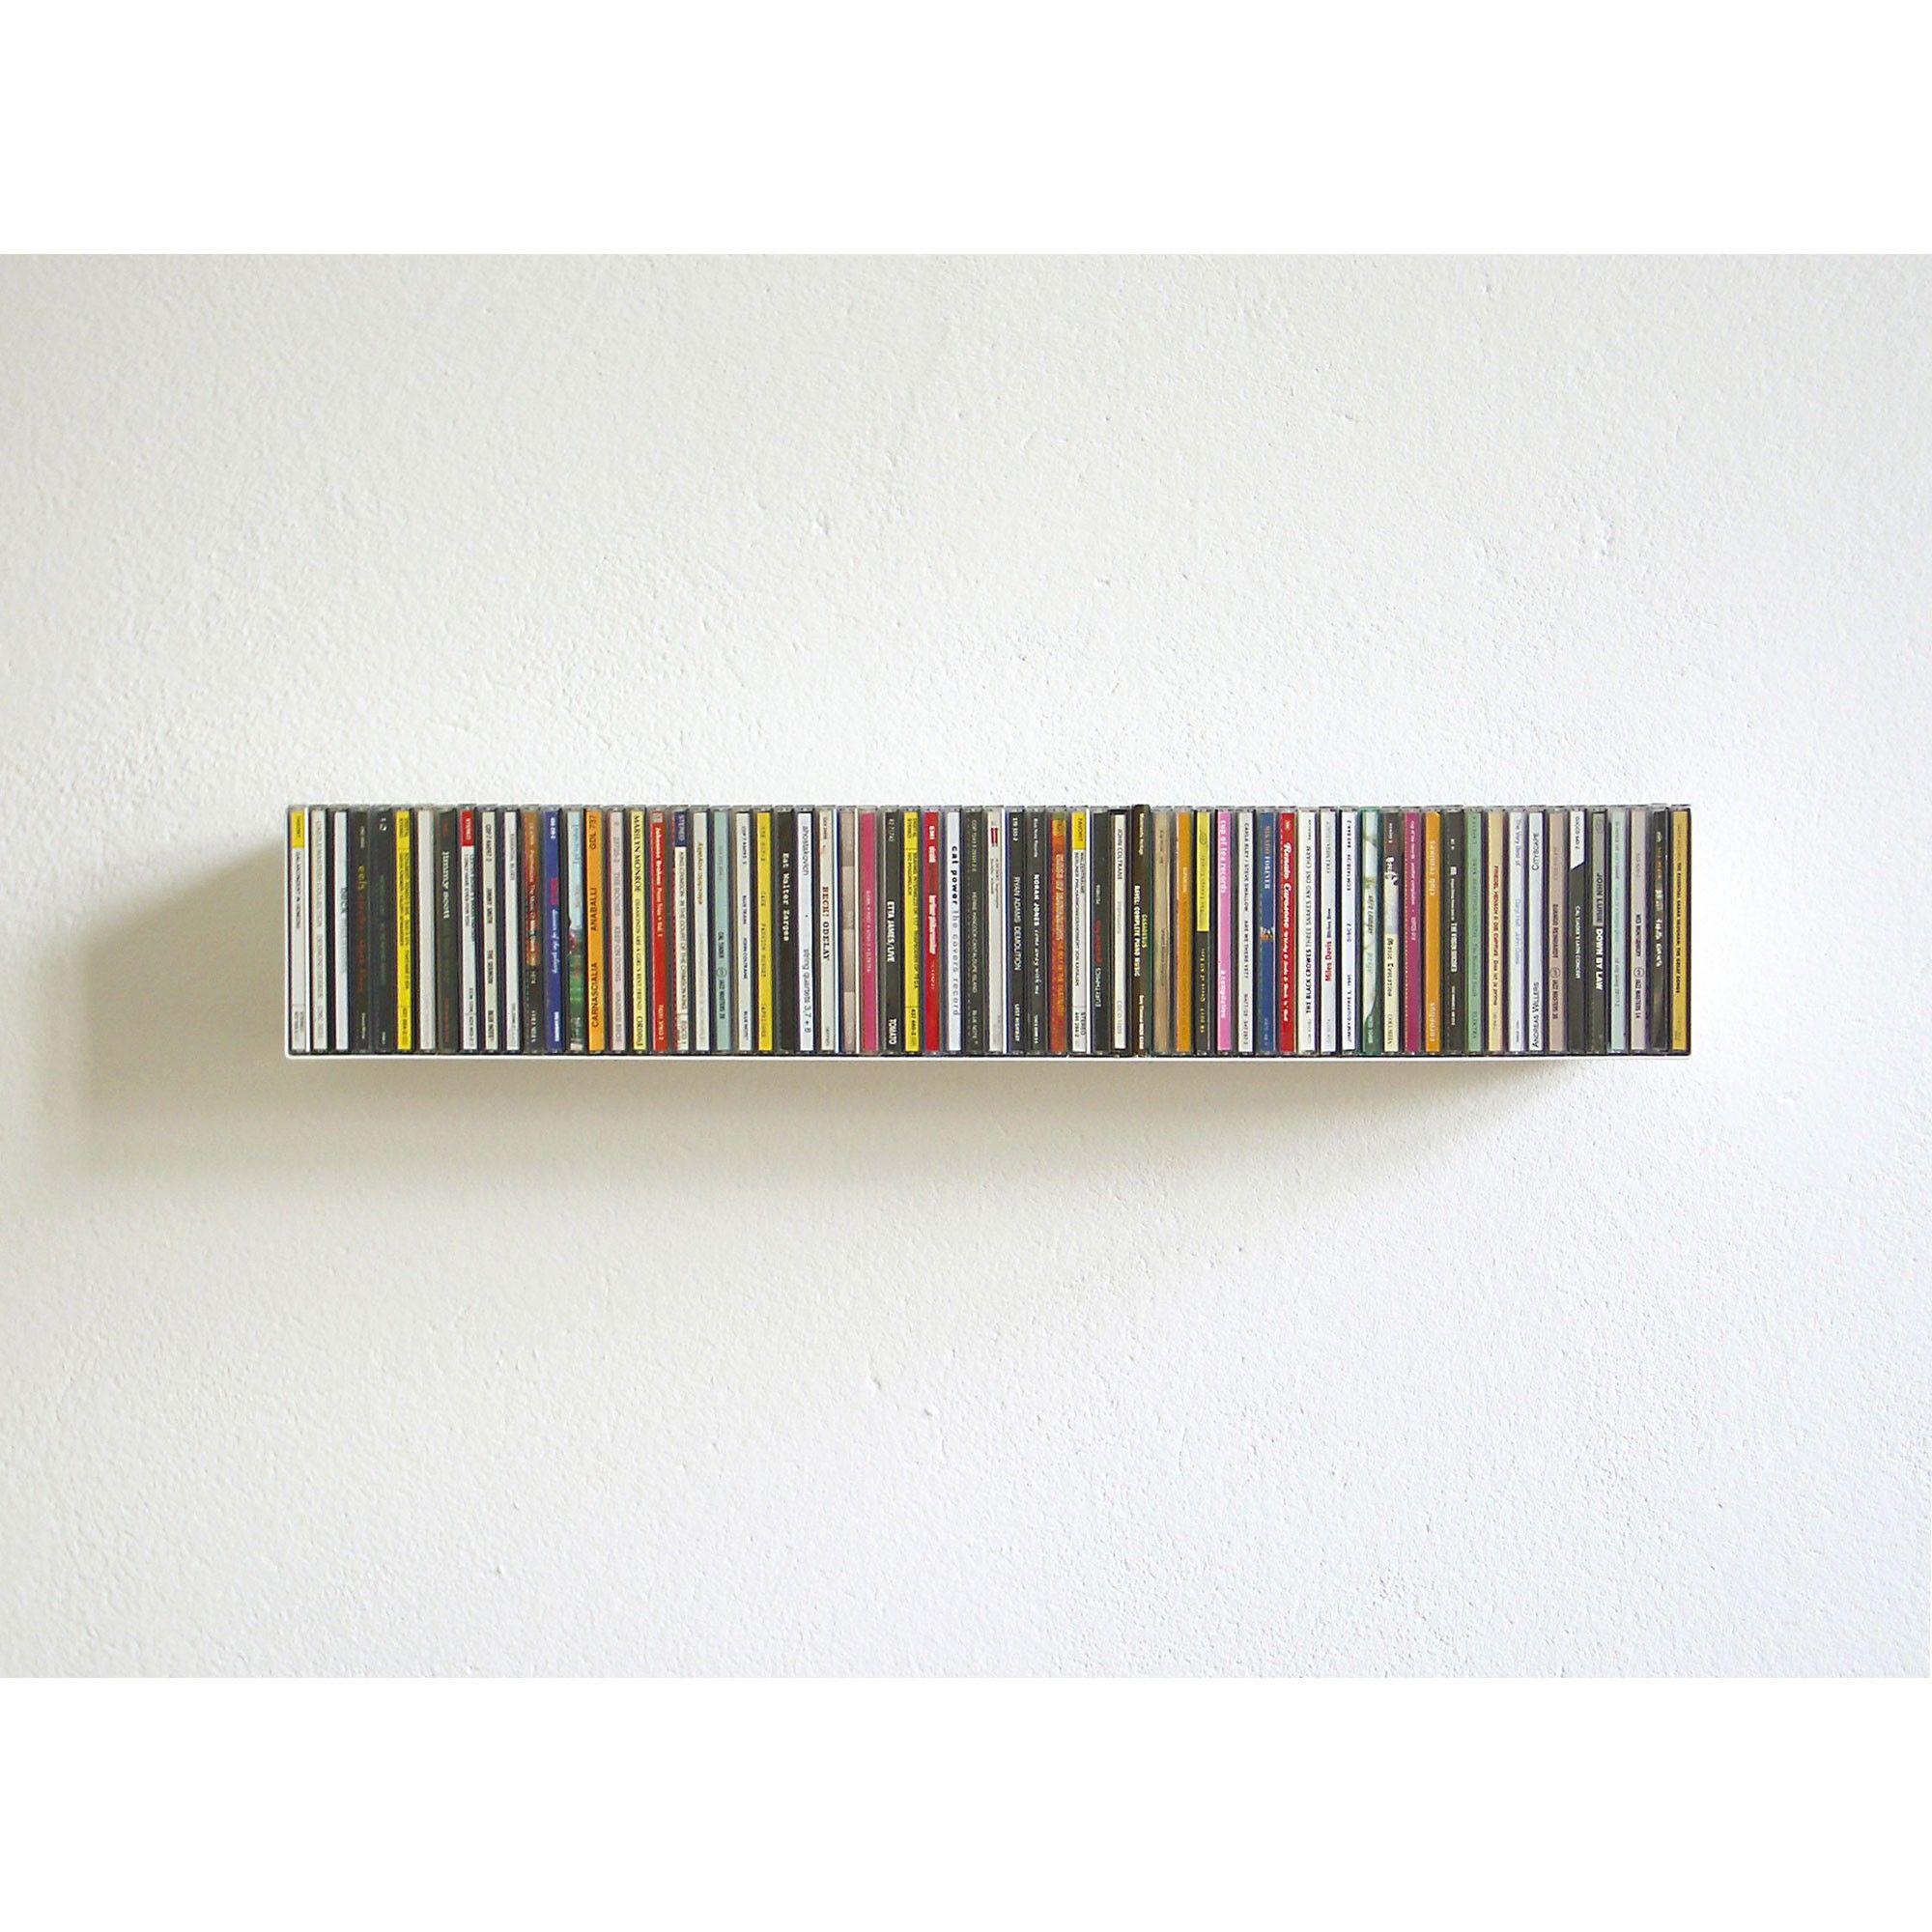 Cd Storage Skandium Compact Disc Shelf B By Linea 1 Cds  # Idee Rangement Cd